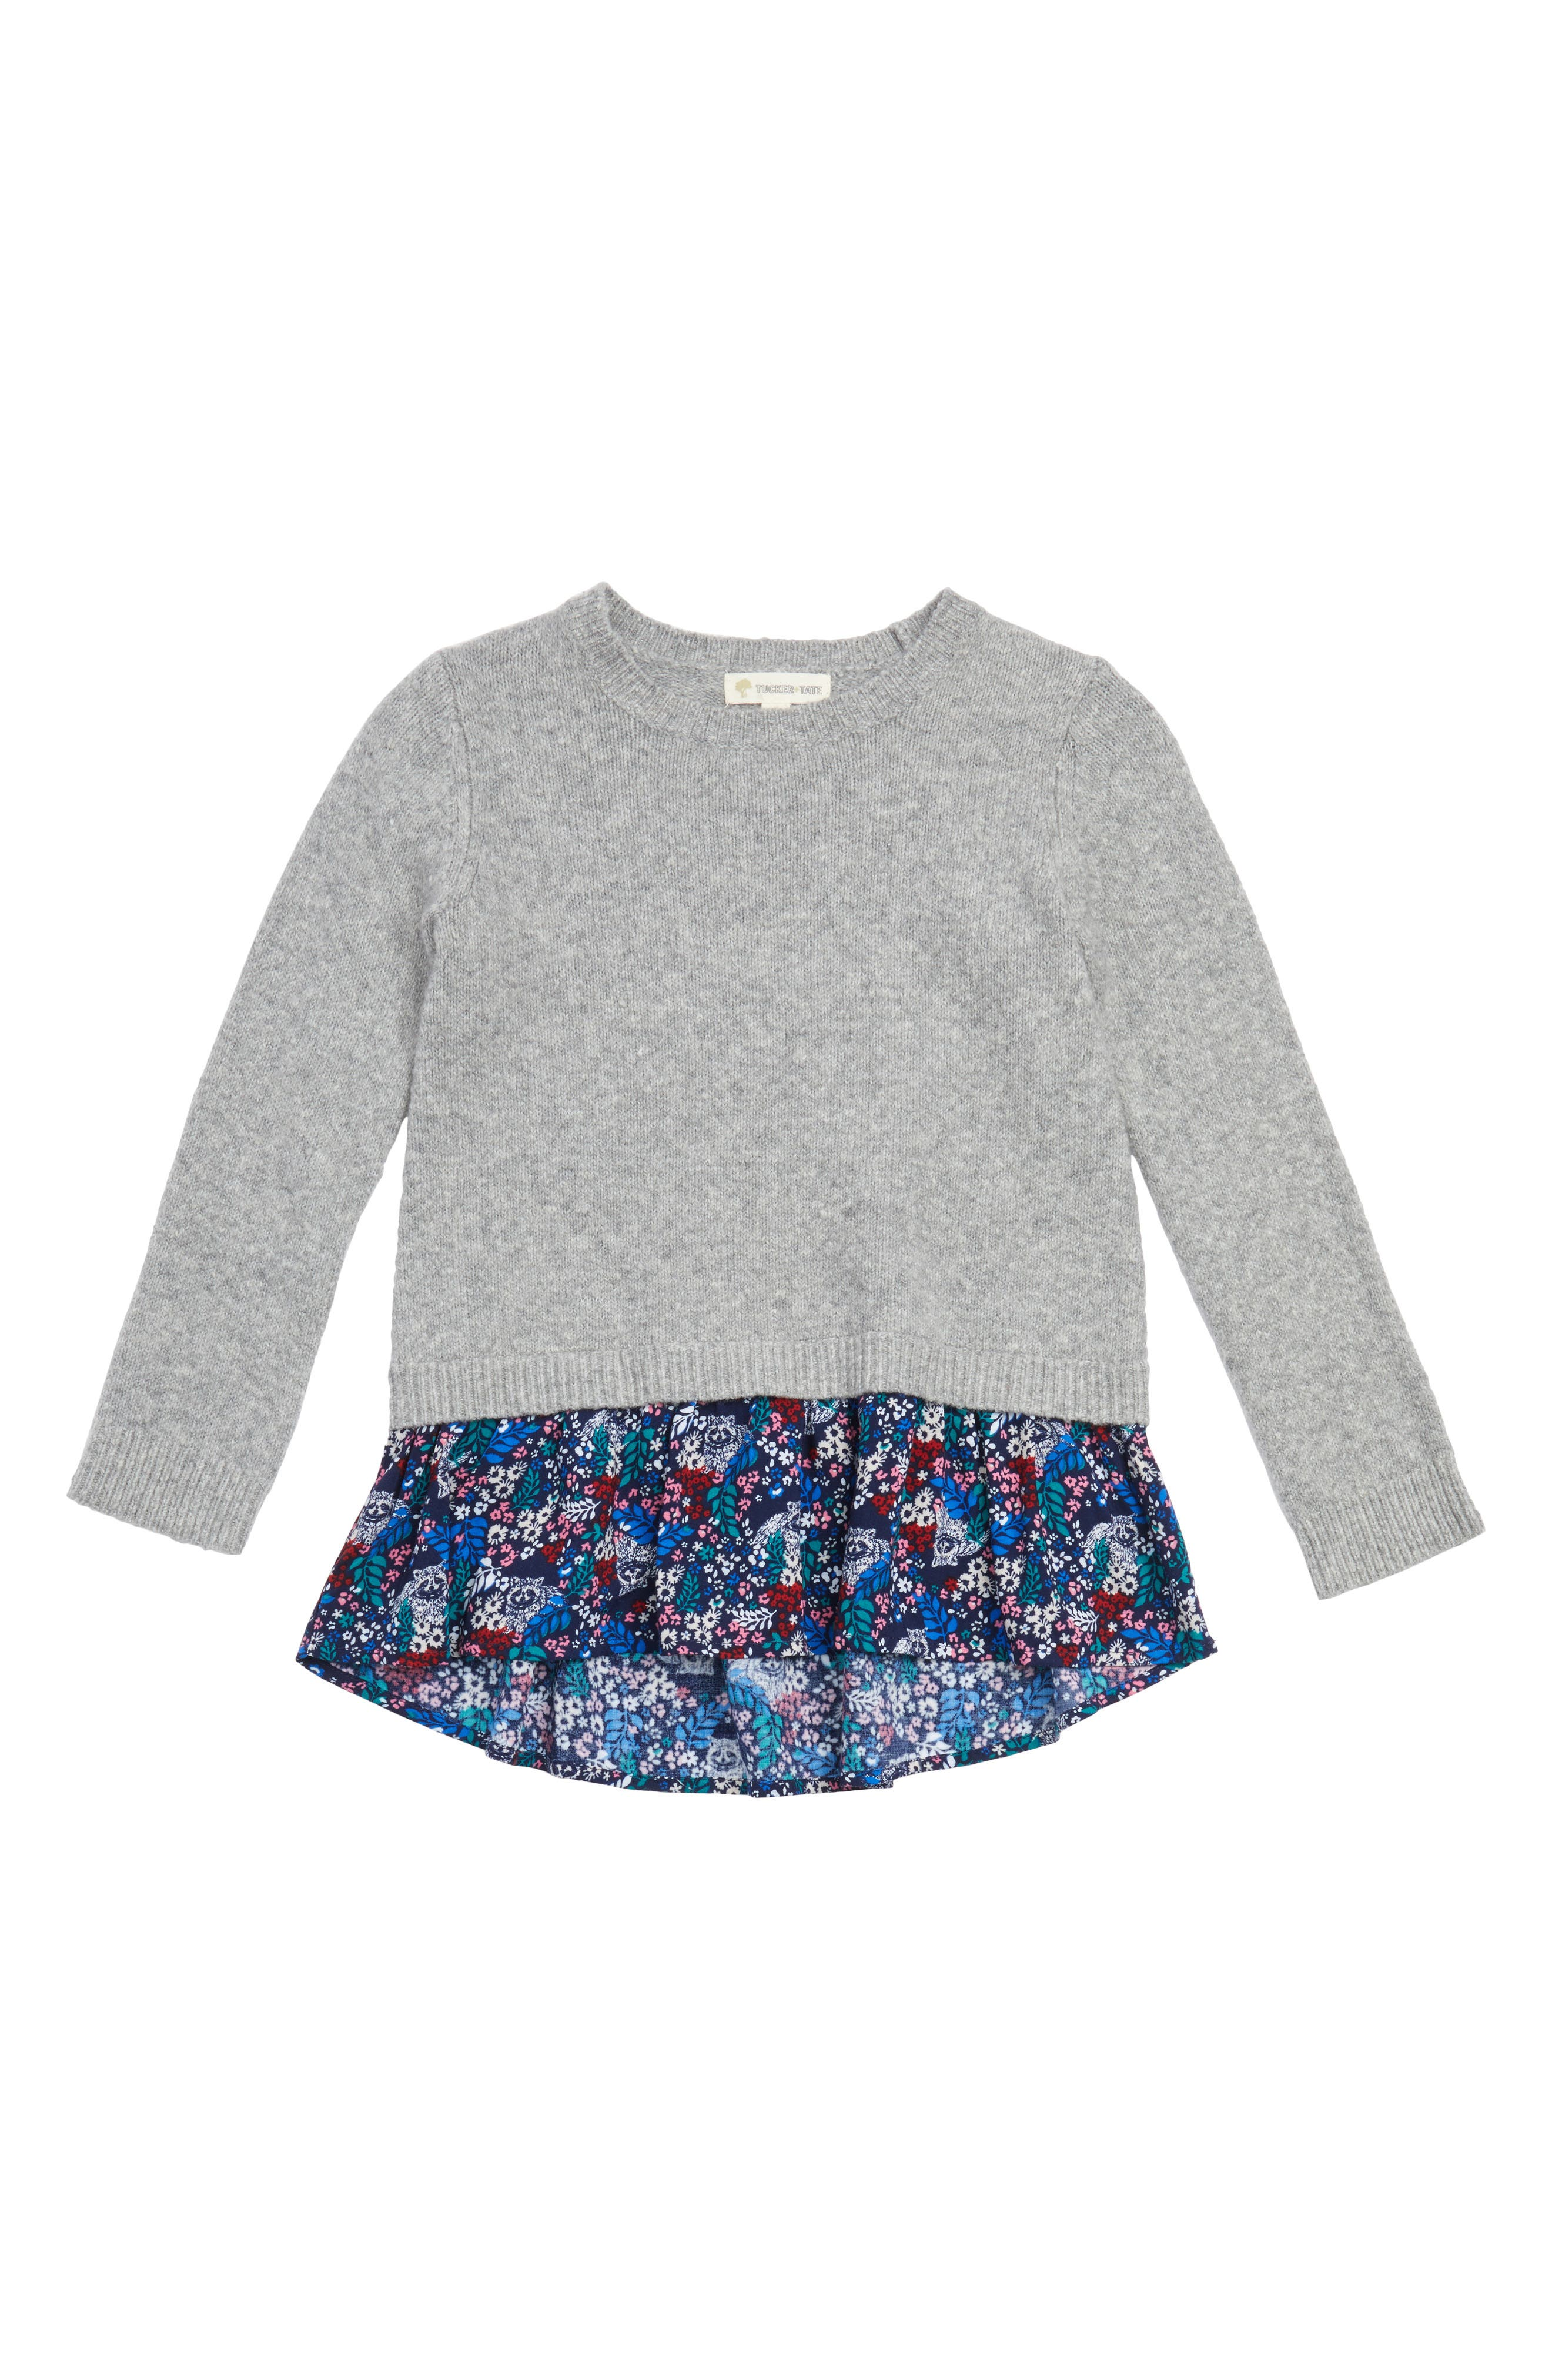 Mixed Media Sweater,                             Main thumbnail 1, color,                             030